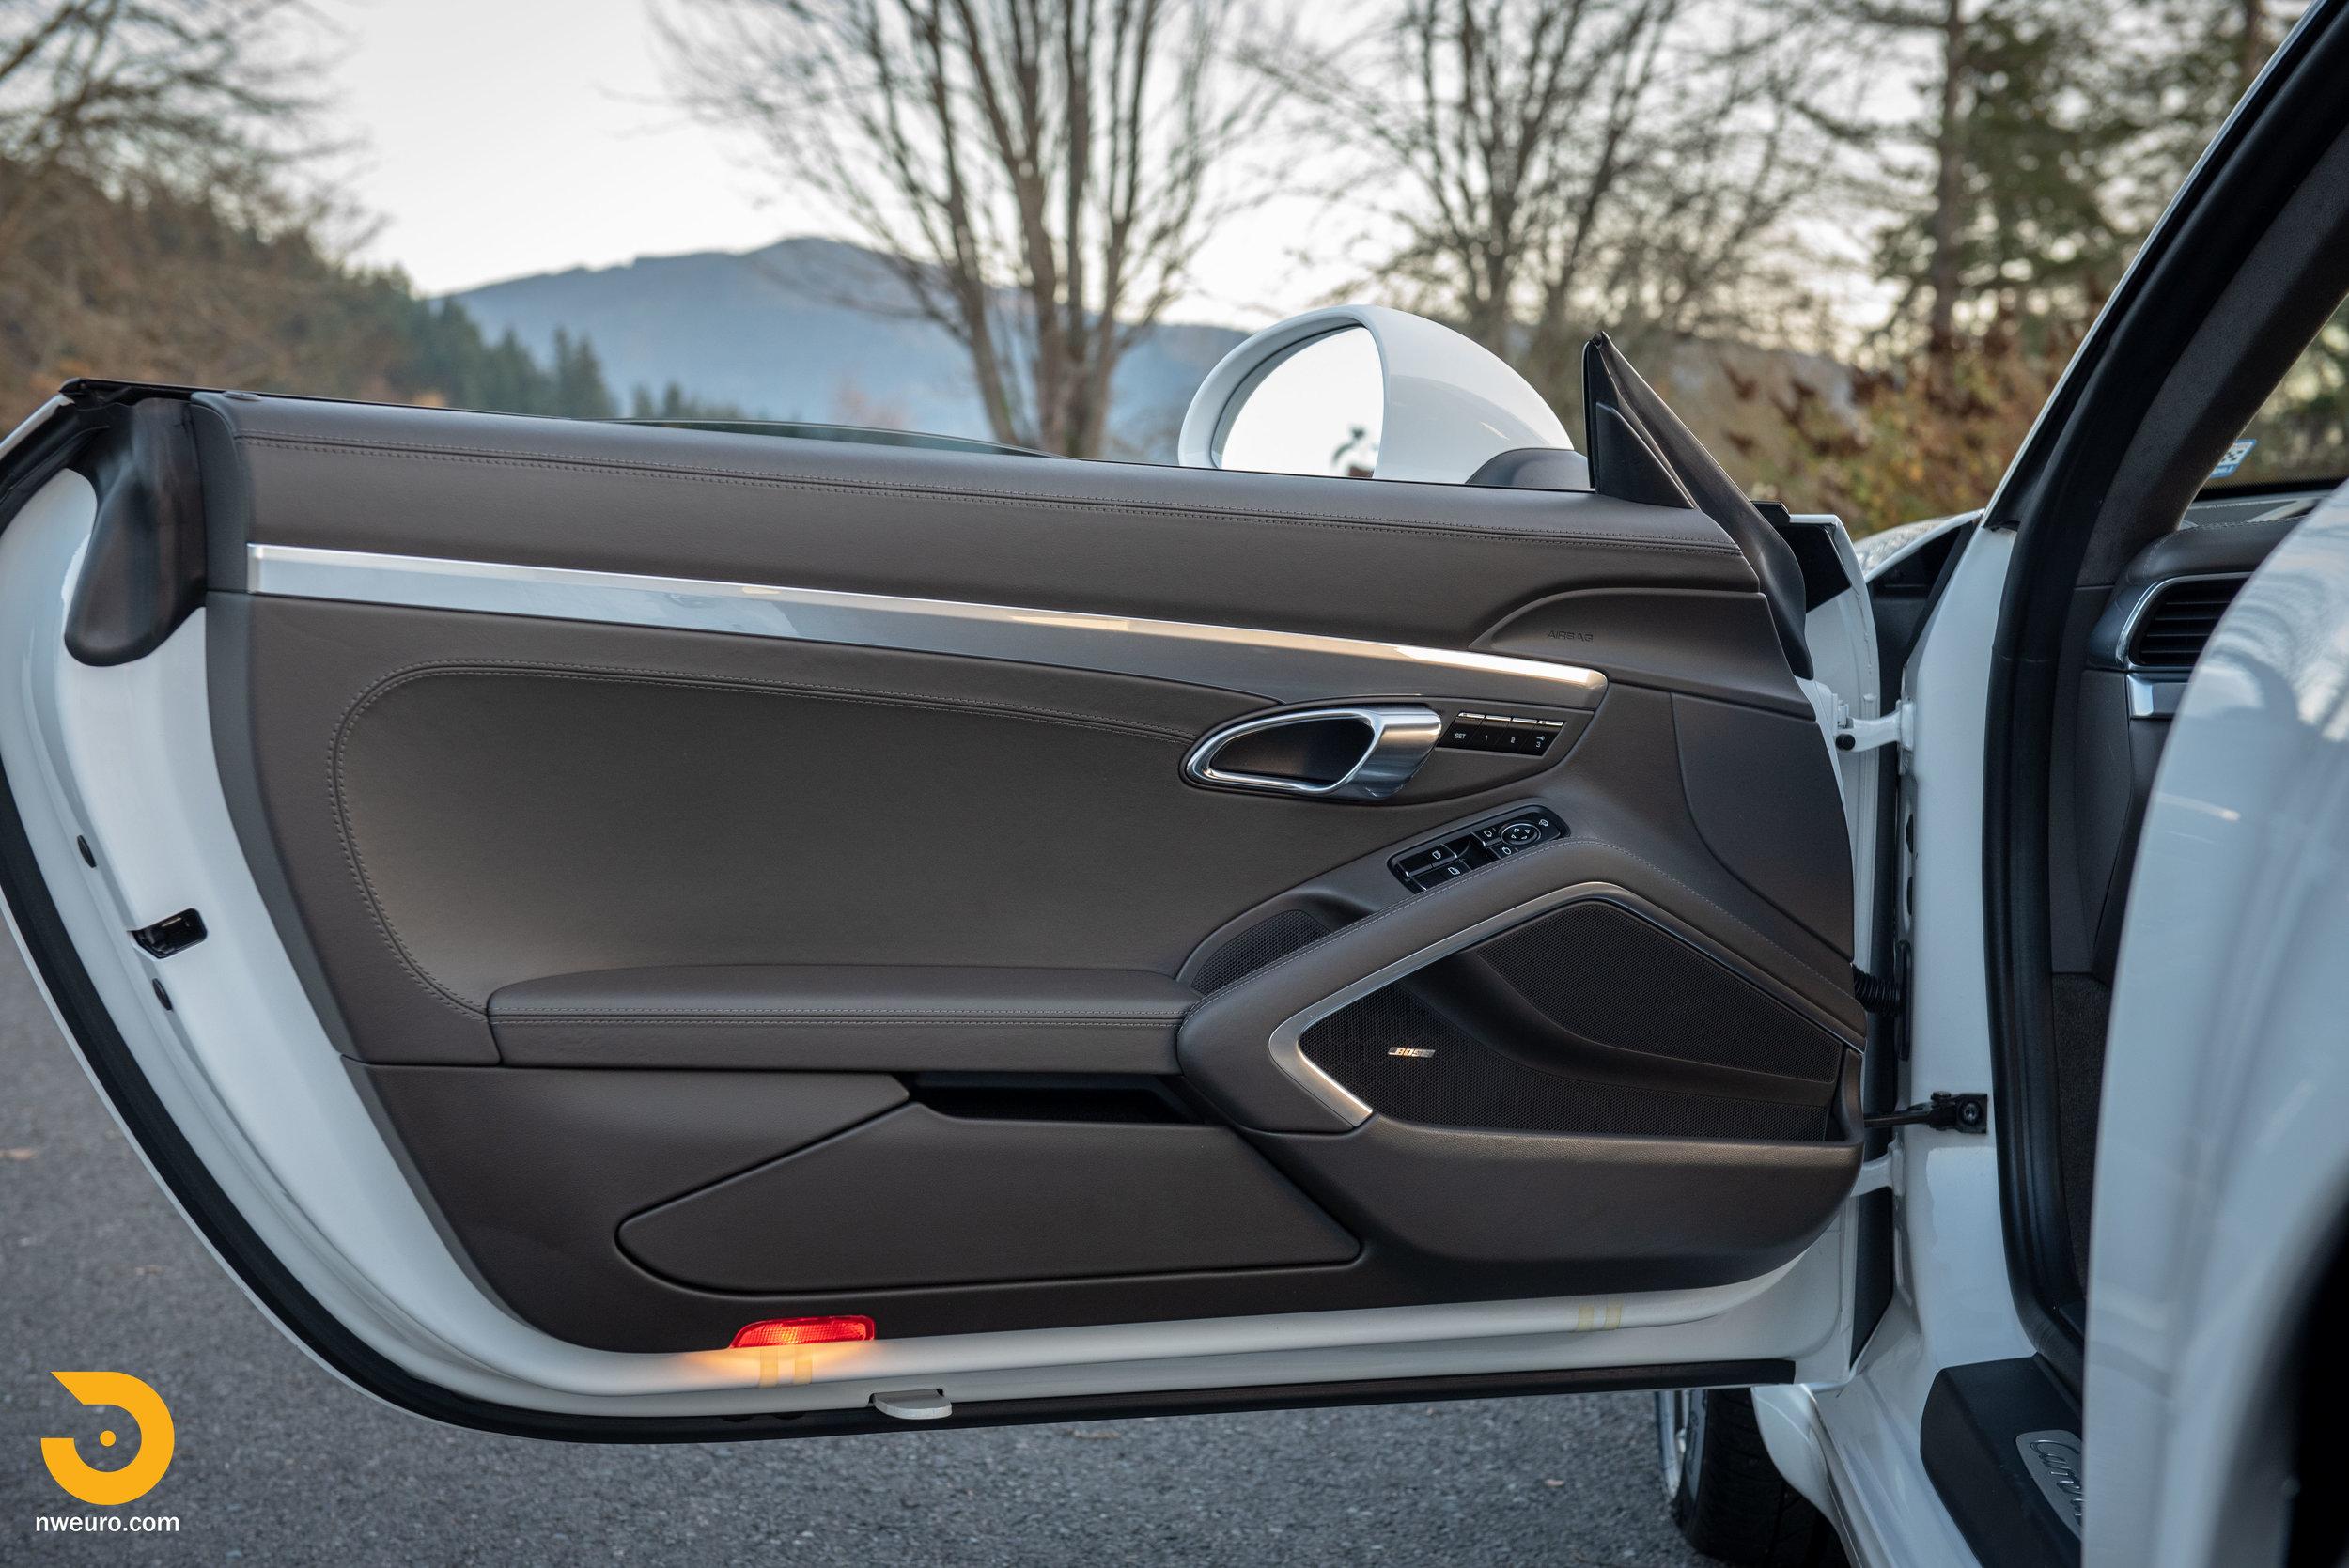 2012 Porsche Carrera S-44.jpg